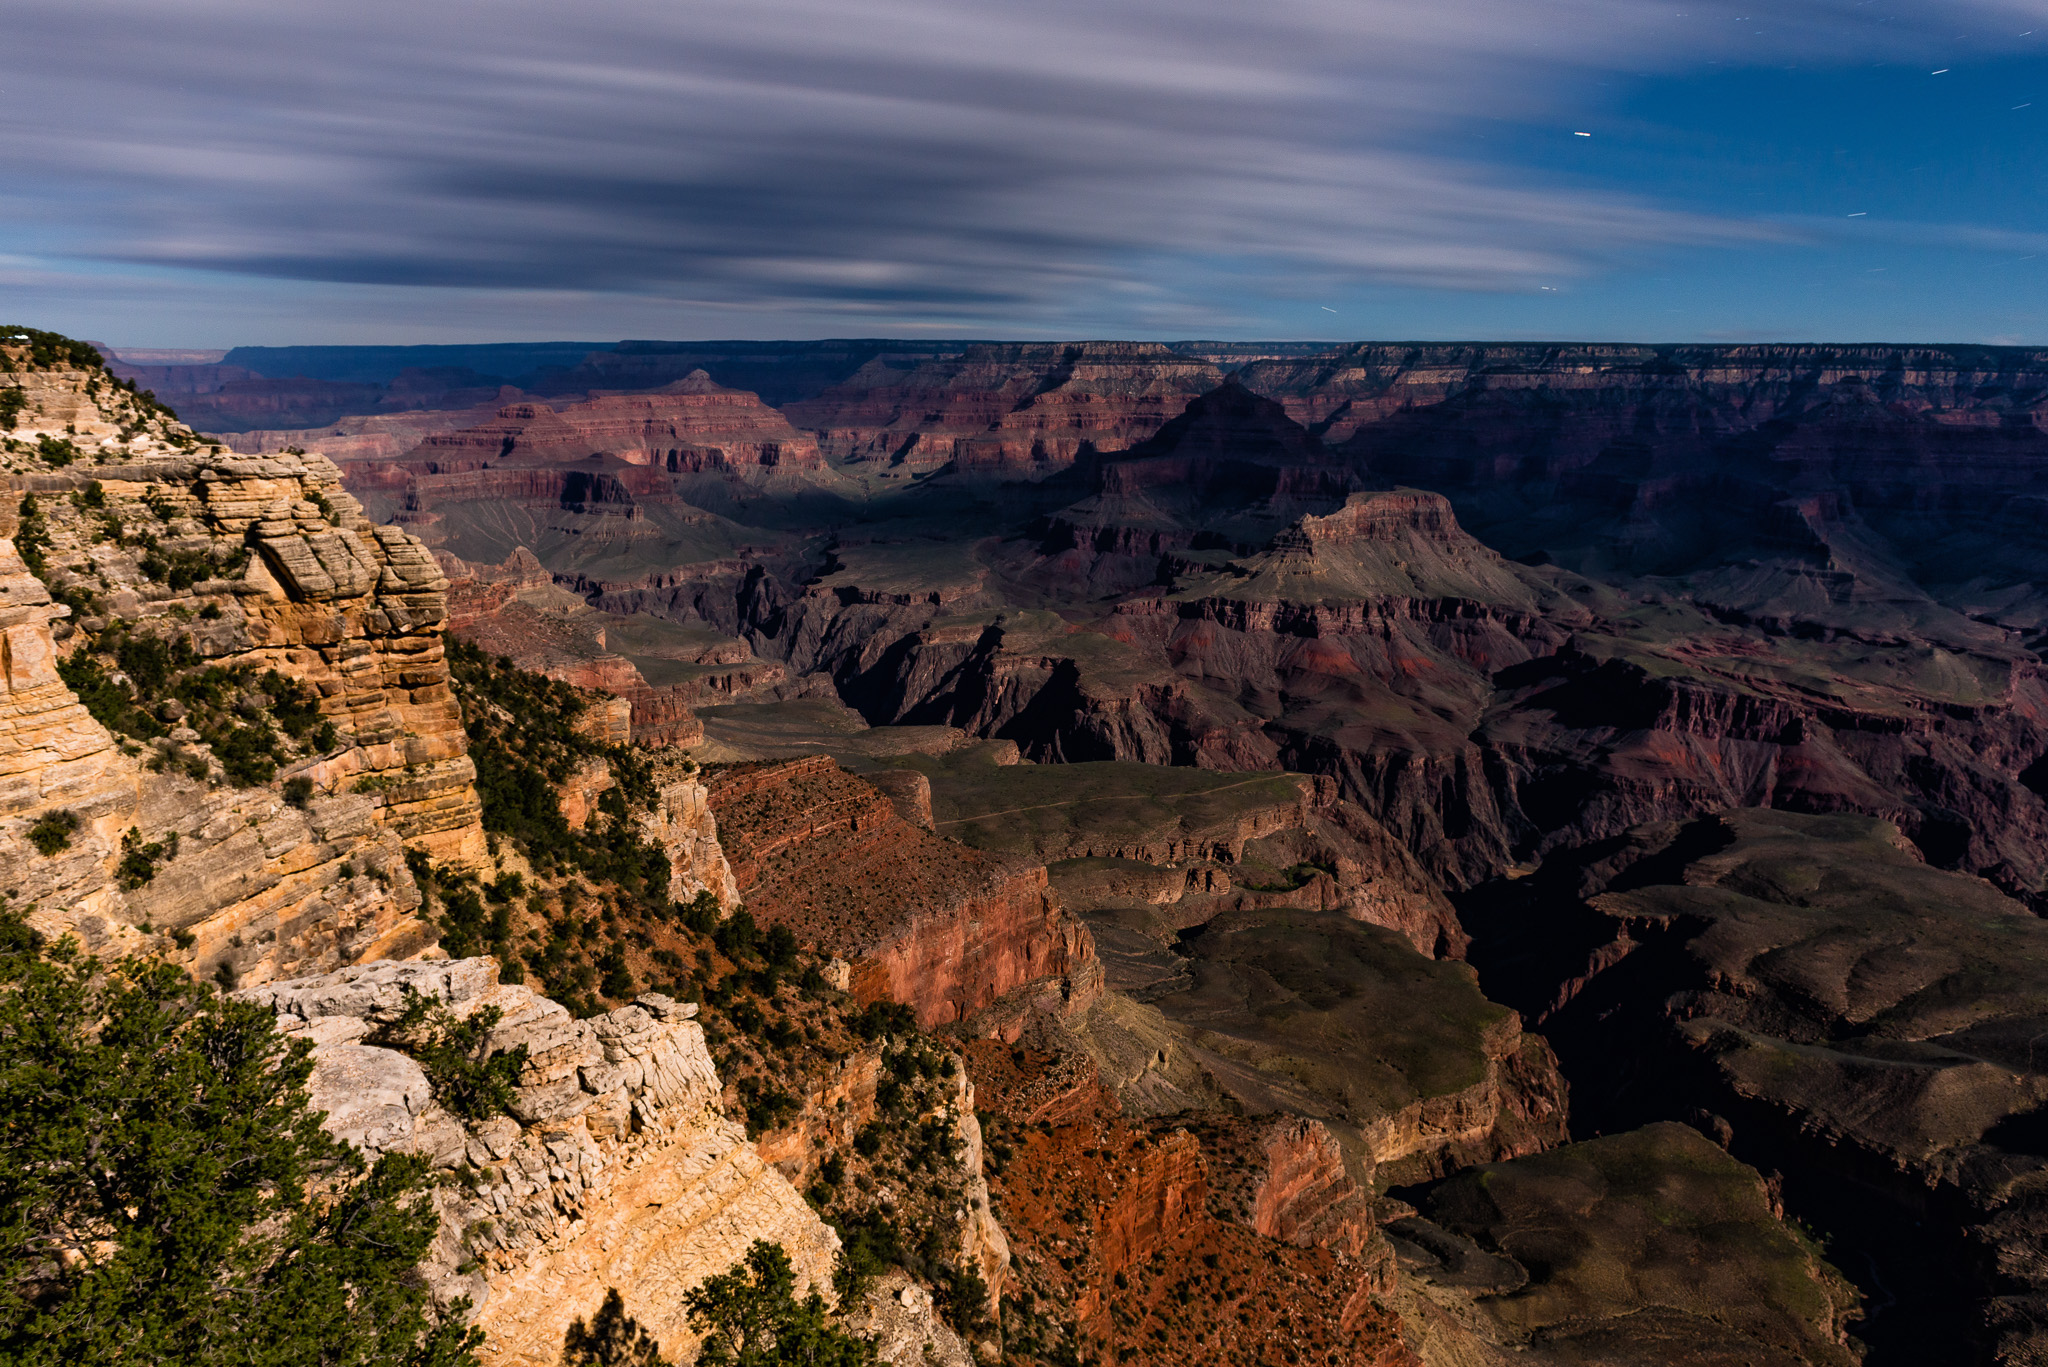 Grand Canyon, Mather Point, South Rim, Arizona, USA